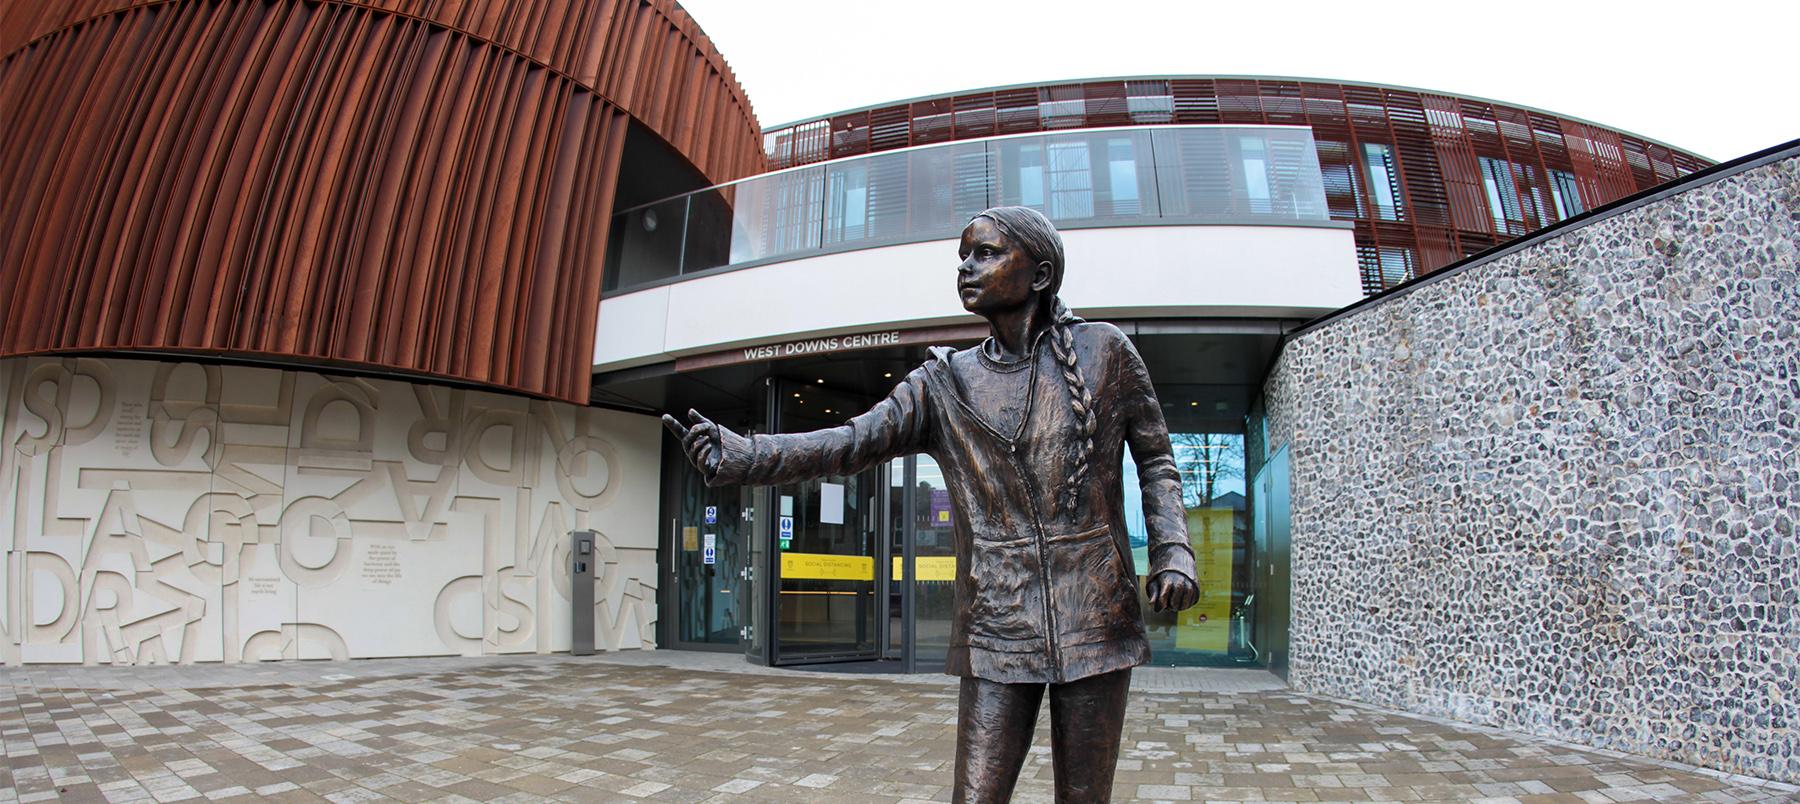 Greta Thunberg bronze statue in front of building